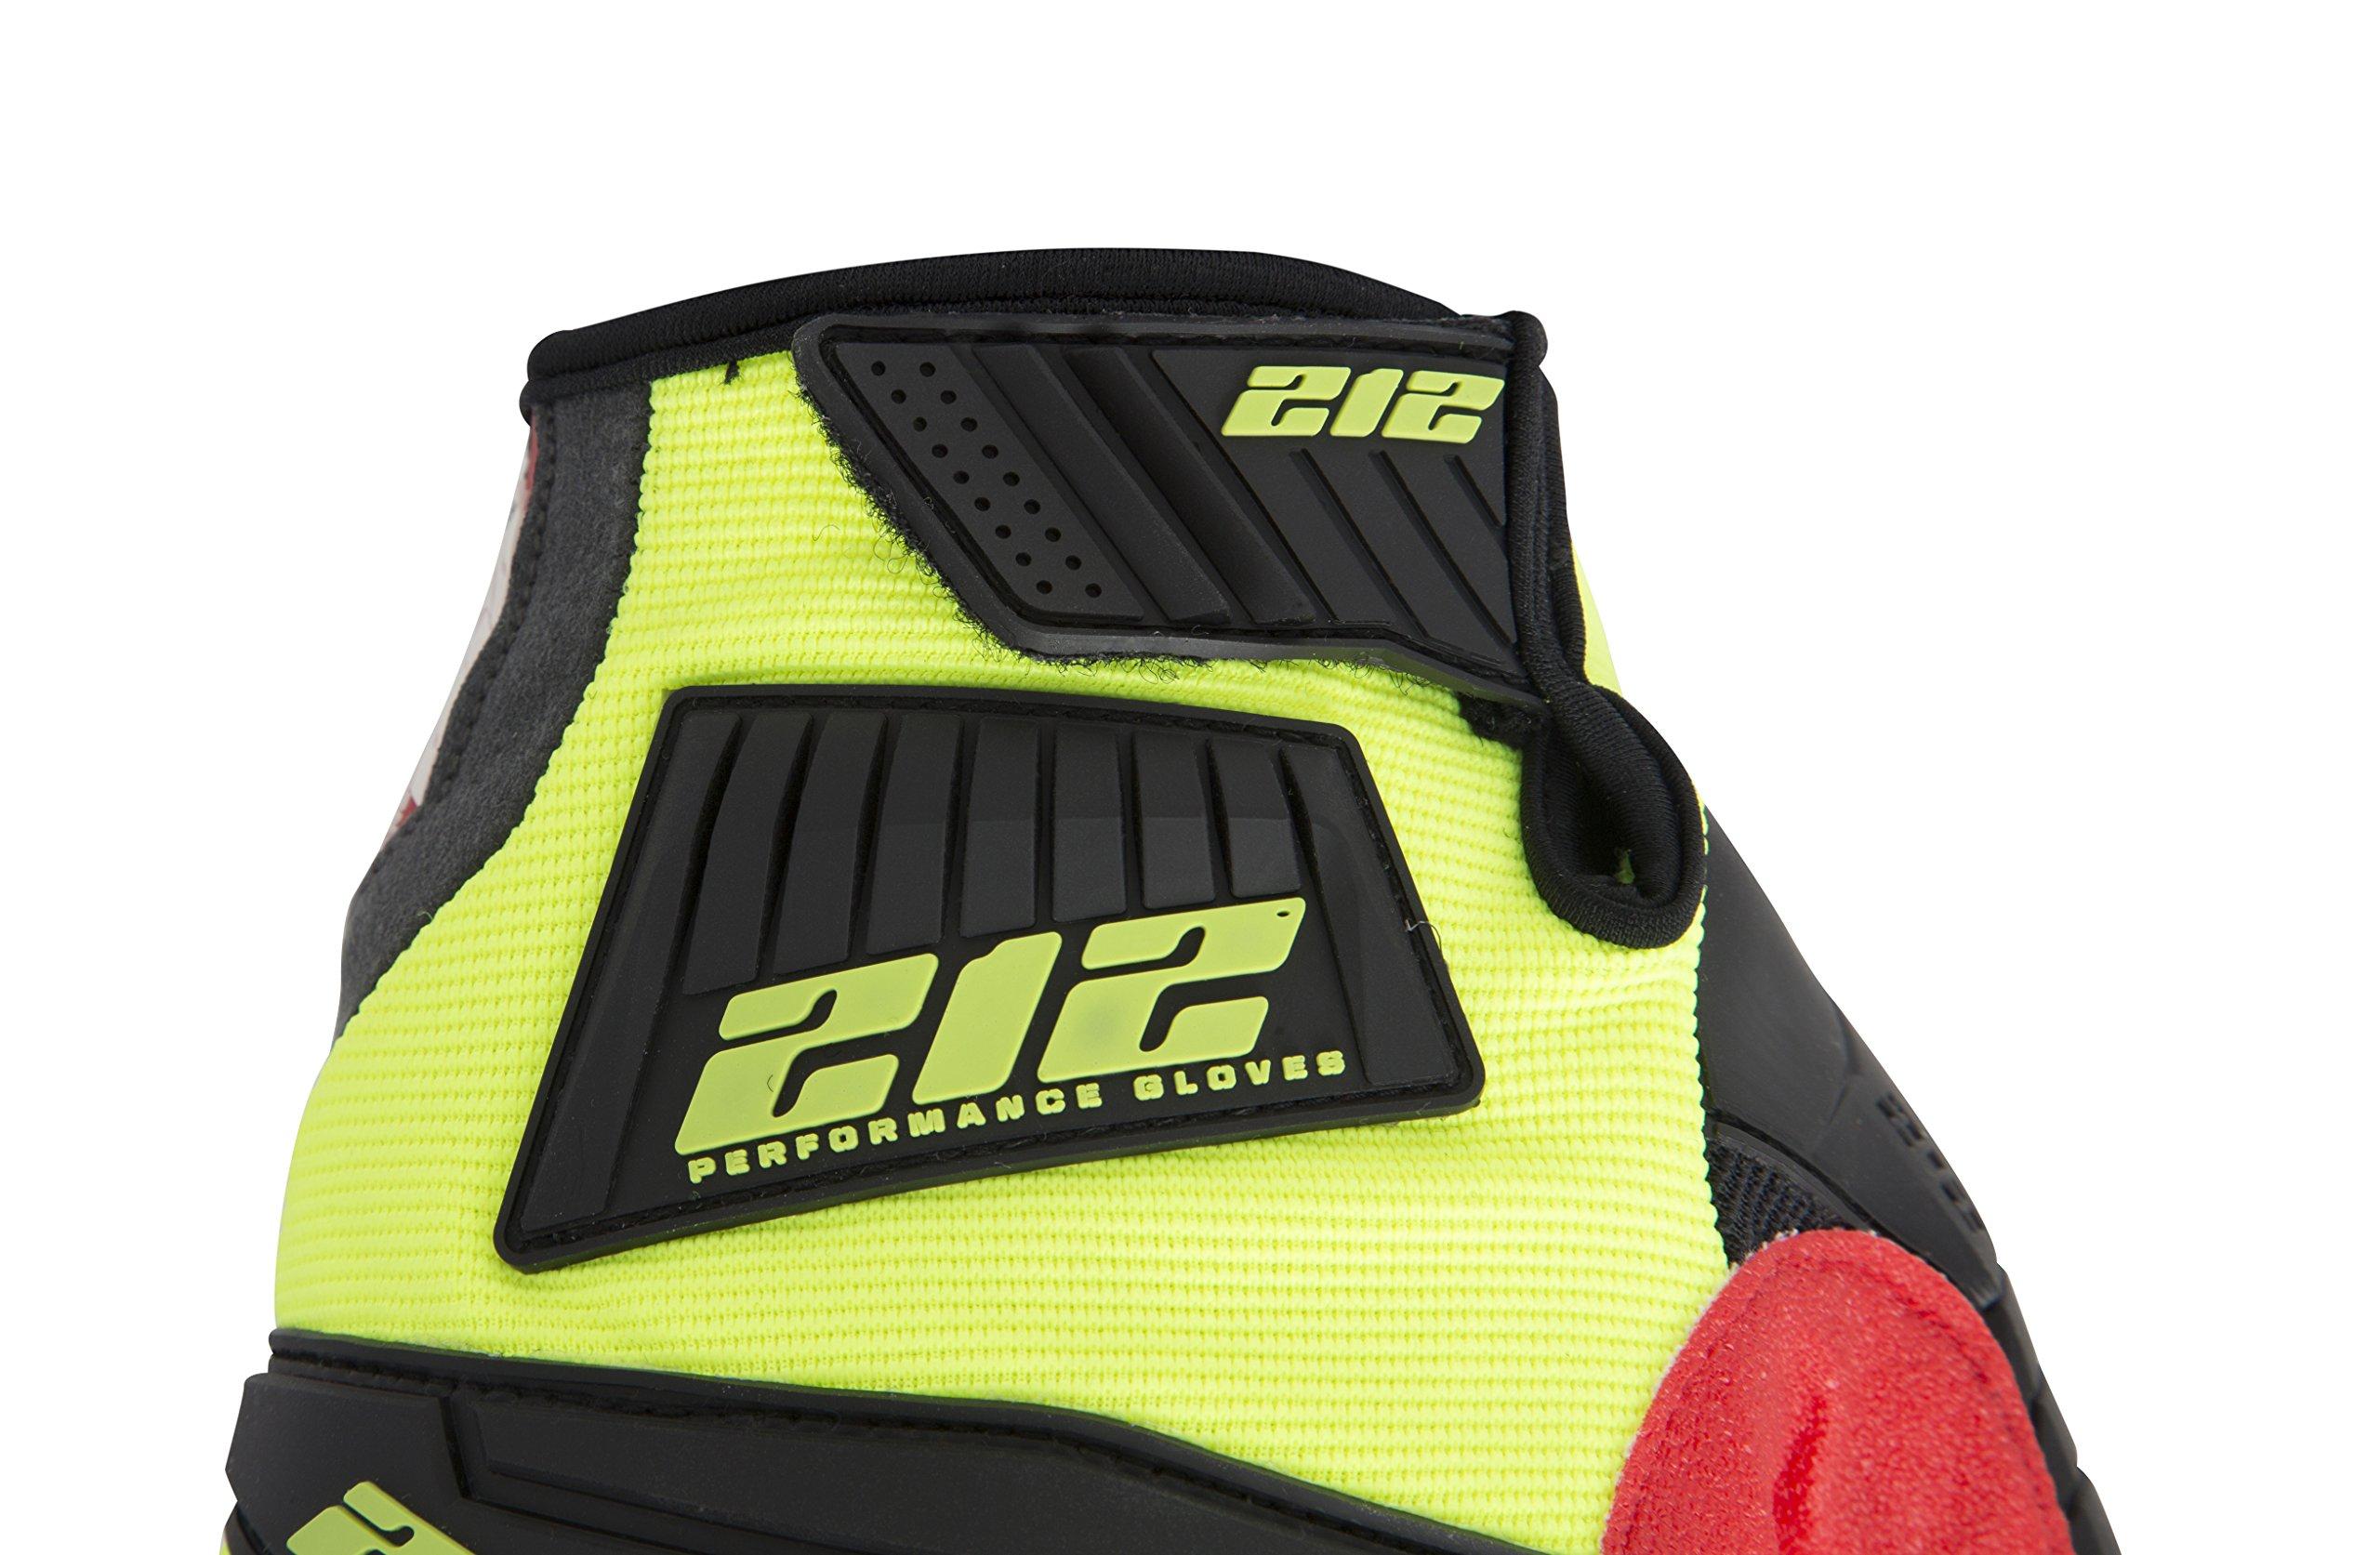 212 Performance Gloves IMP-88-009 Super Hi-Vis Impact Gloves, Medium by 212 Performance Gloves (Image #4)